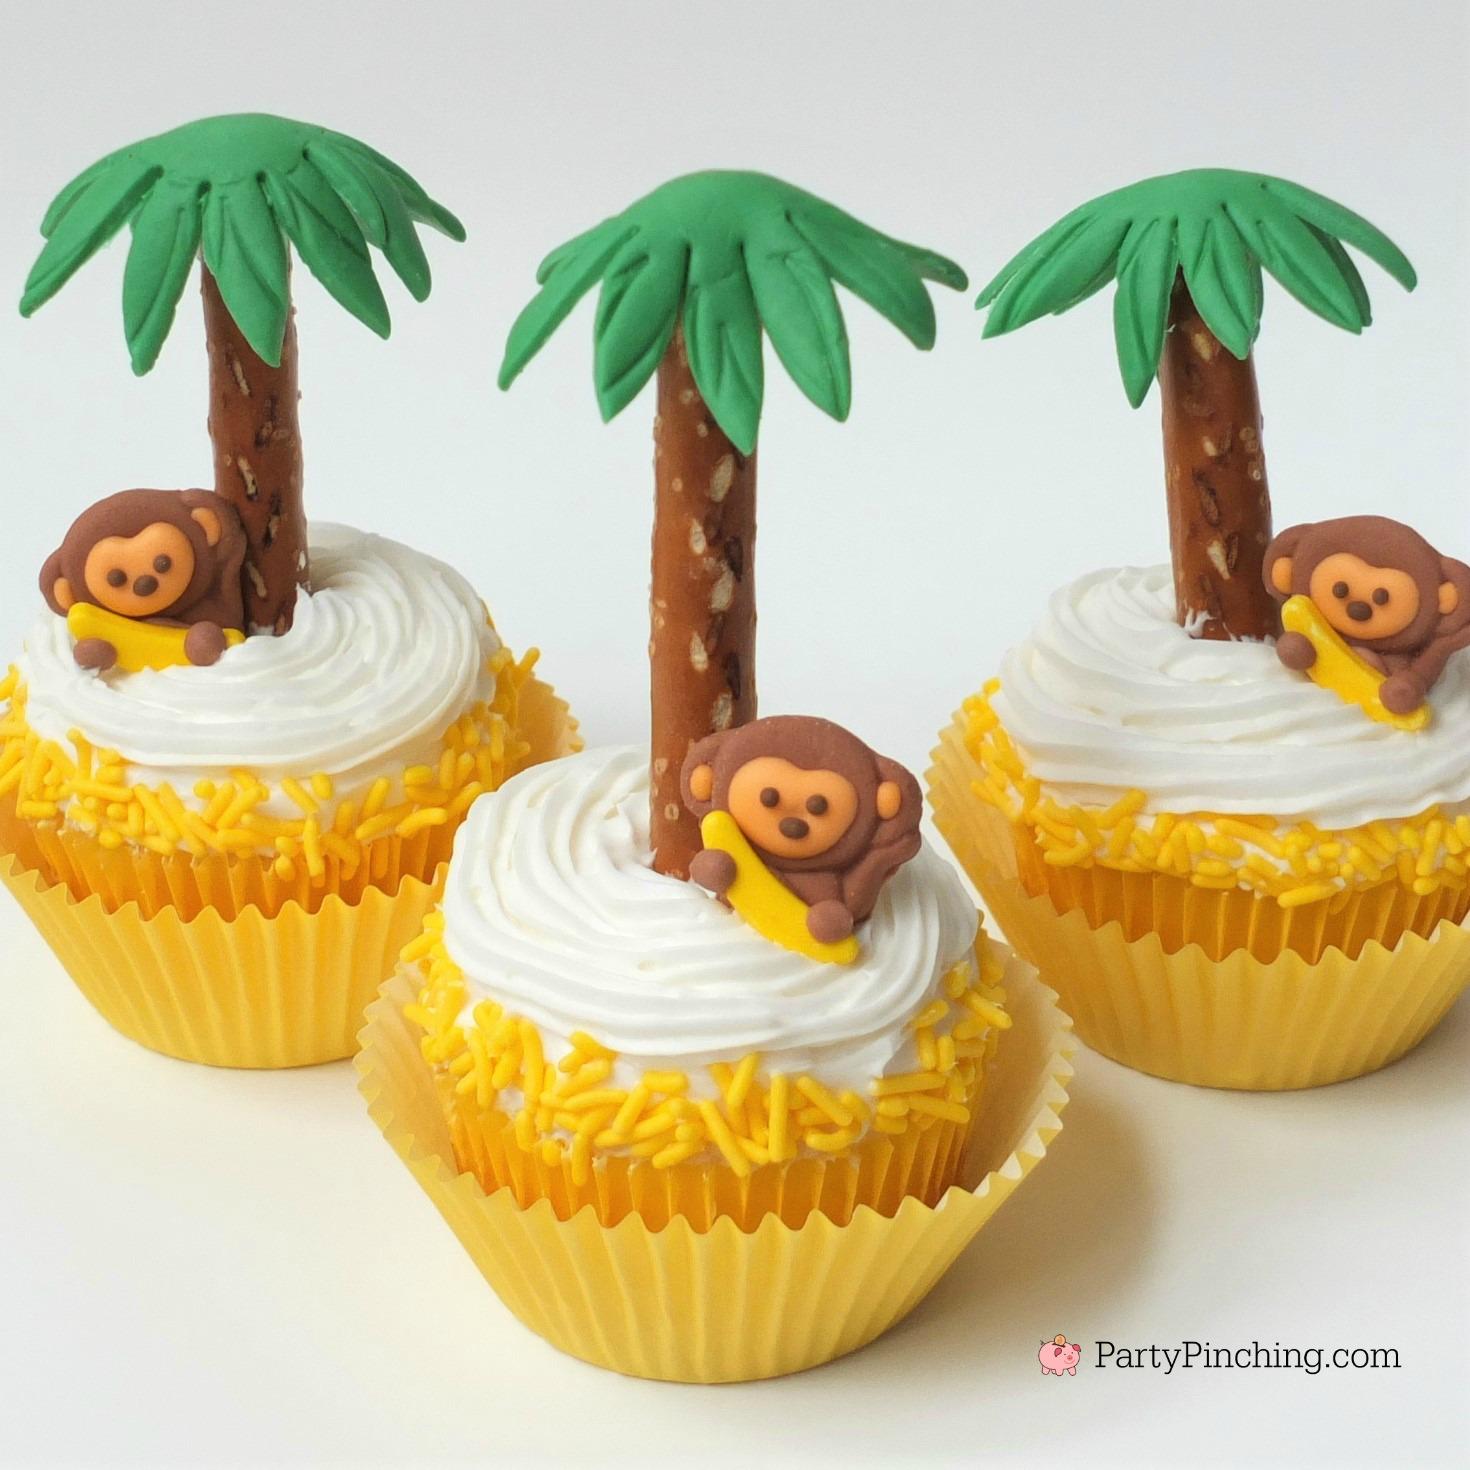 Monkey Cupcakes Safari Jungle Party Ideas Cute Adorable For Kids Fun Food